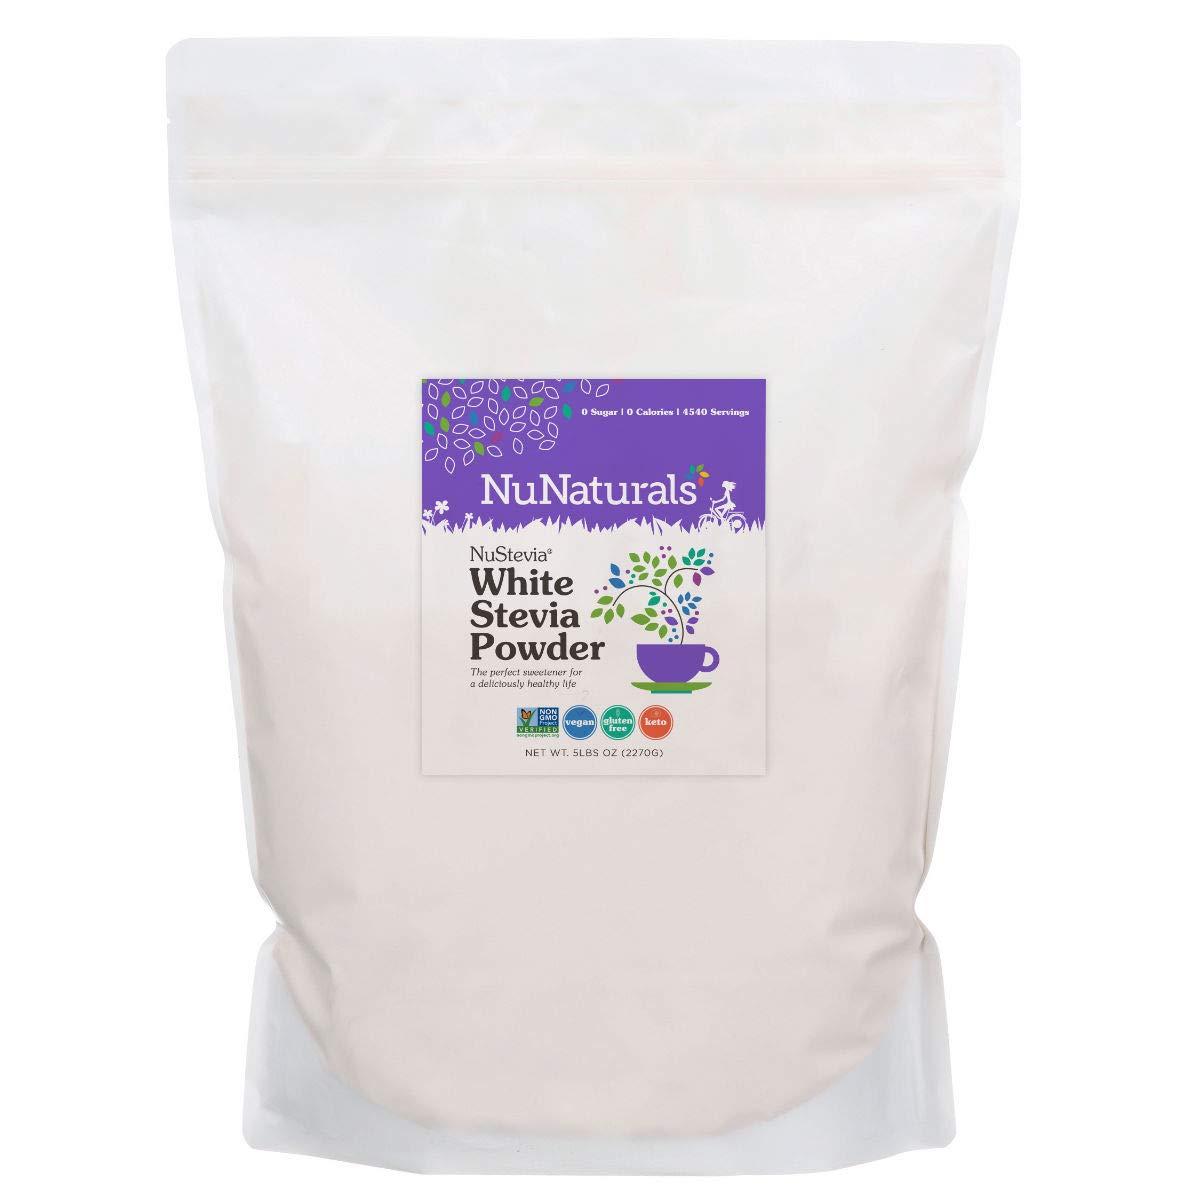 NuNaturals White Stevia Powder, All Purpose Natural Sweetener, Sugar Free 5 LBs